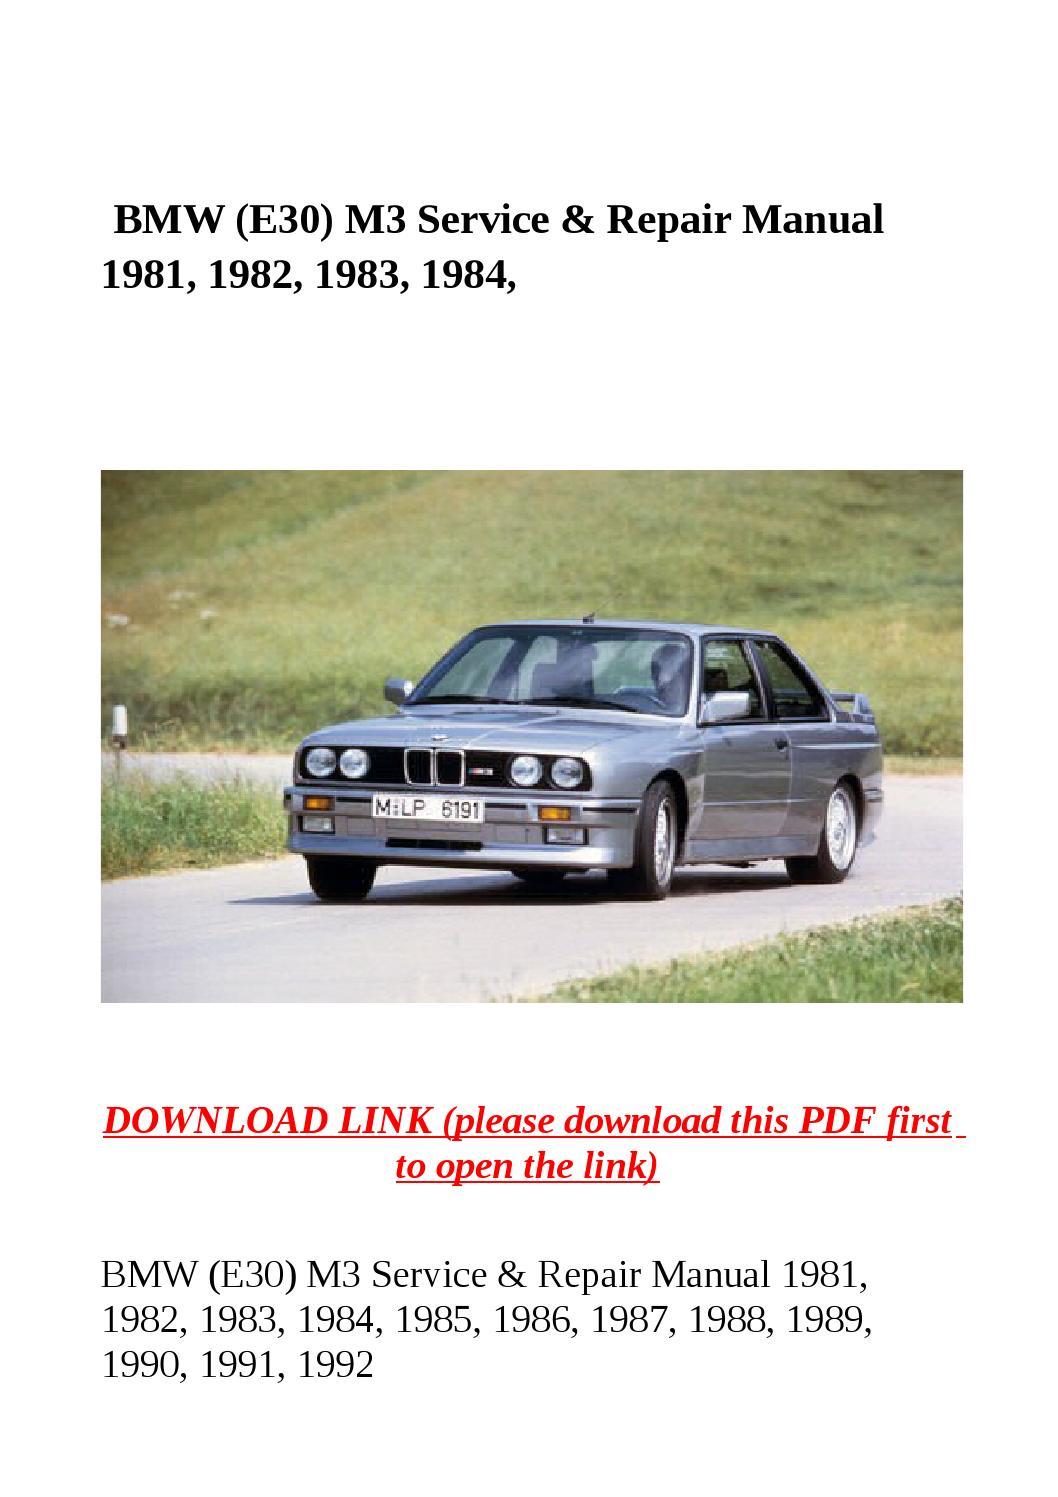 Bmw (e30) m3 service & repair manual 1981, 1982, 1983, 1984, by yghj - issuu